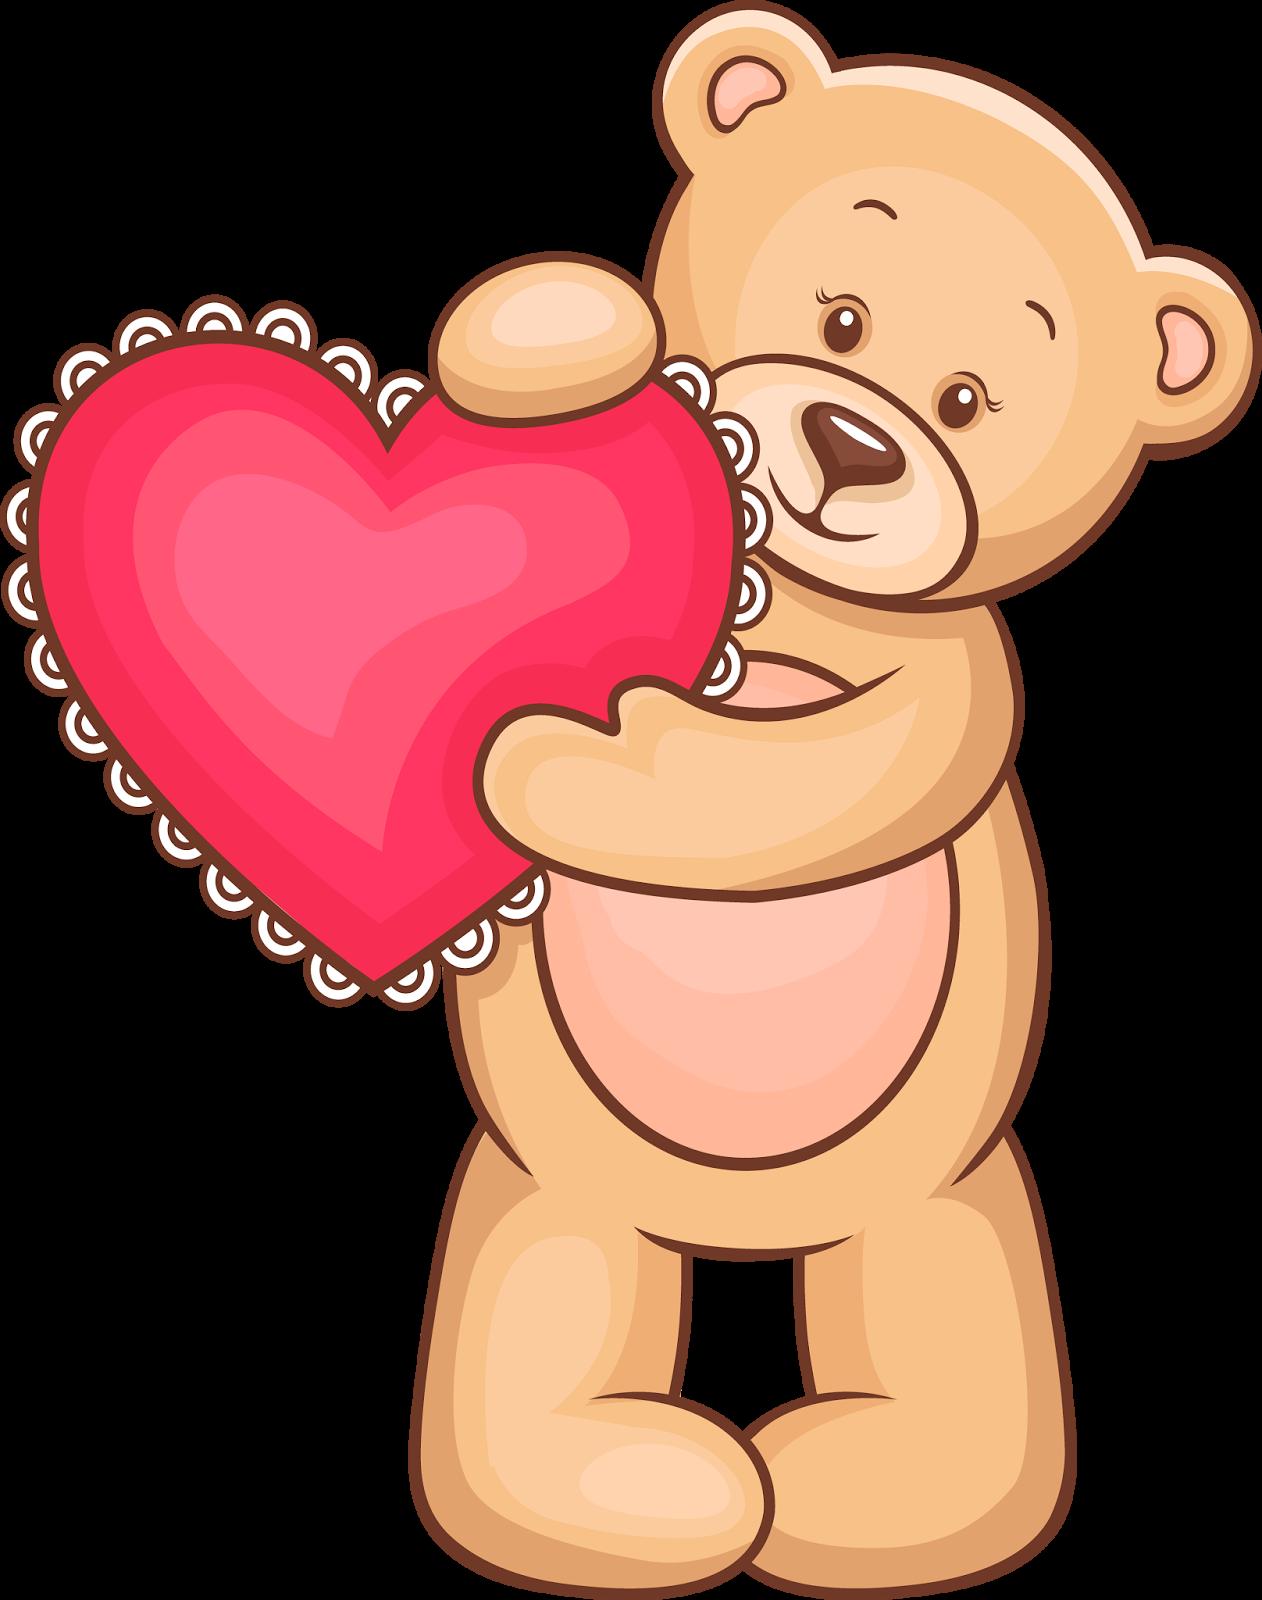 Картинки про мишек с сердечками, картинки днем